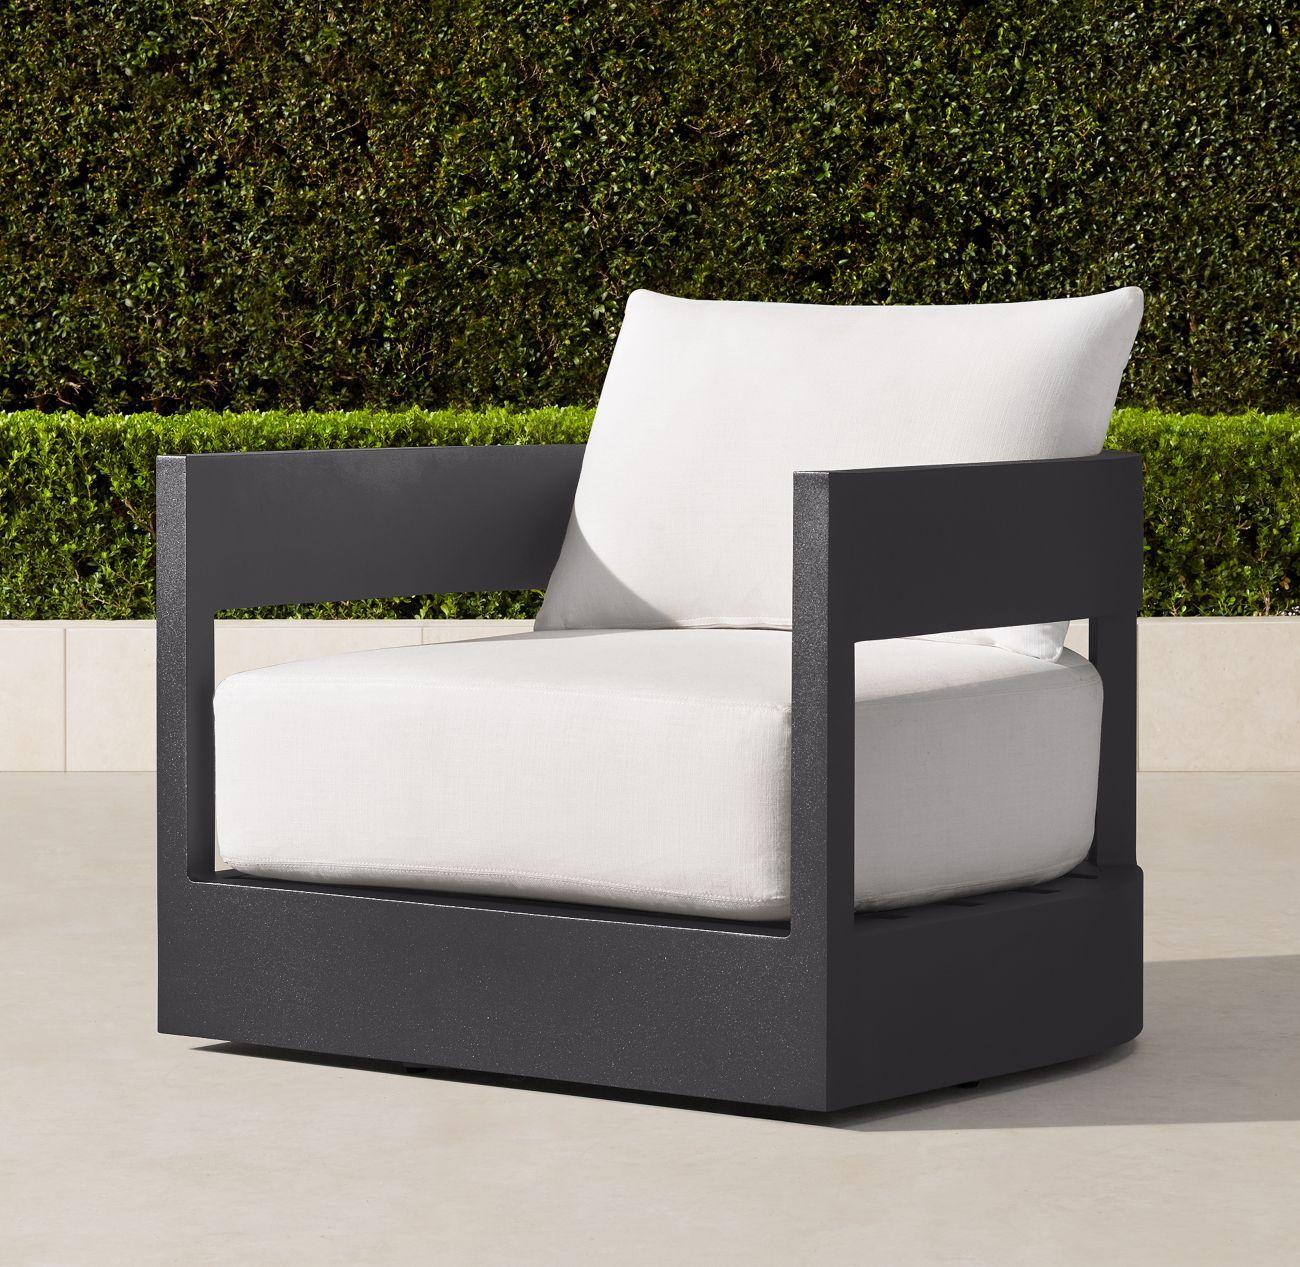 Balmain aluminum swivel lounge chair lounge chair